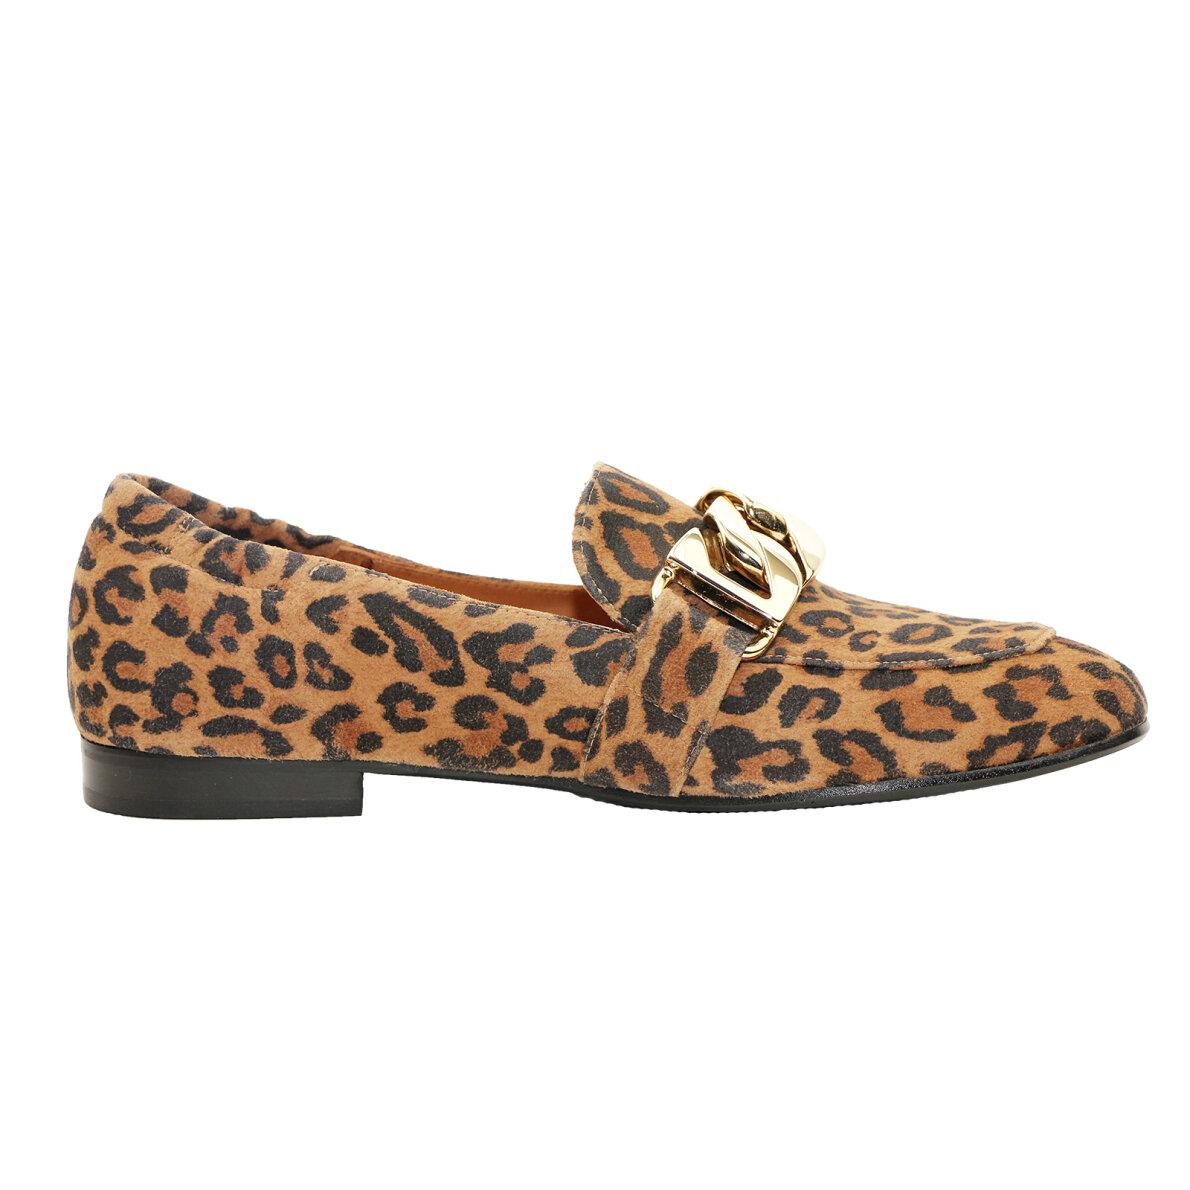 ba2832b1ebe Billi Bi 6522 Leopard Loafer - Billi Bi Loafers - Piedi.dk